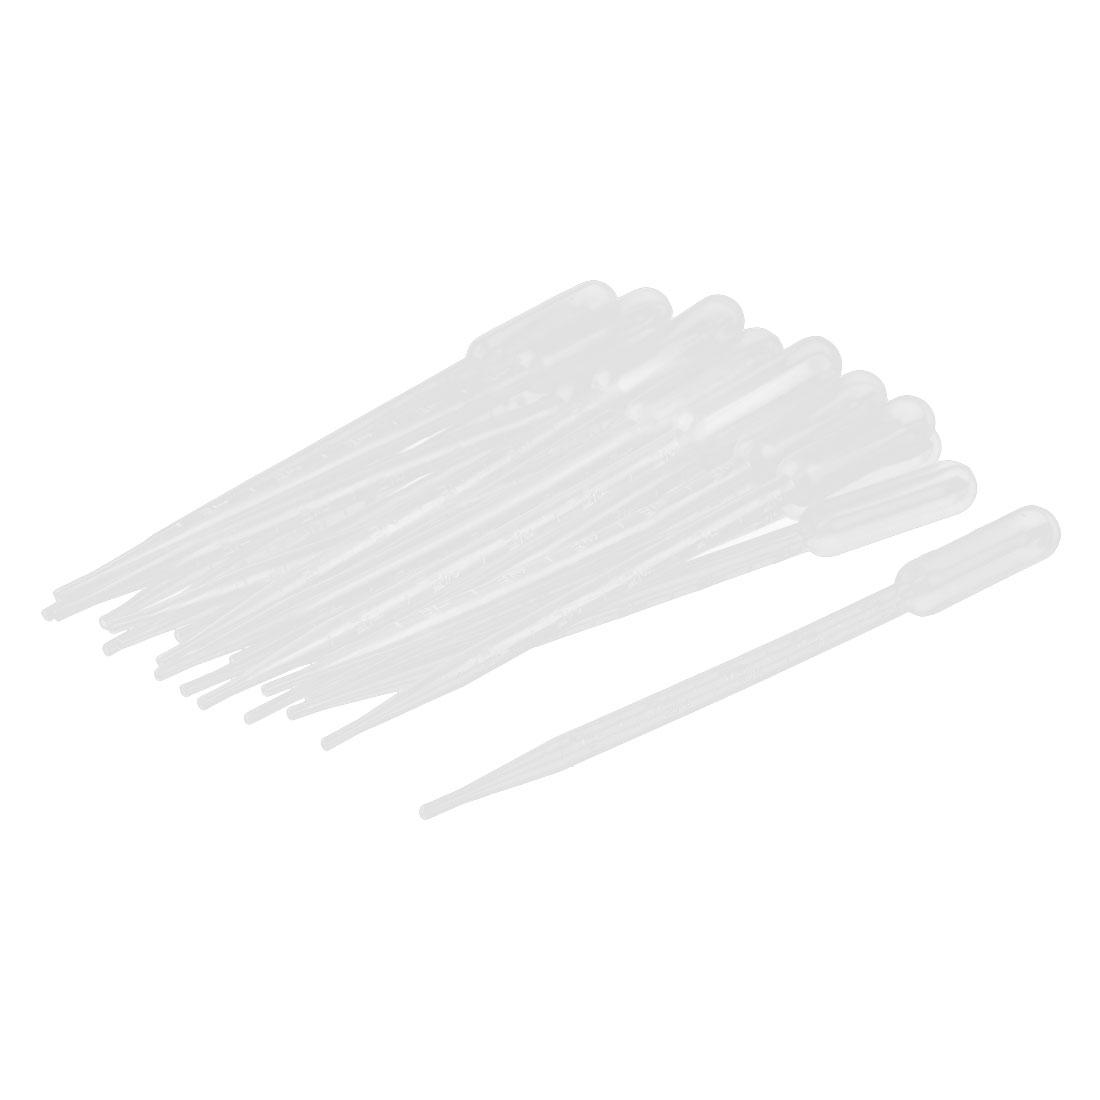 Plastic Transfer Pipettes Graduated Dropper Clear 5ml Capacity 20 Pcs